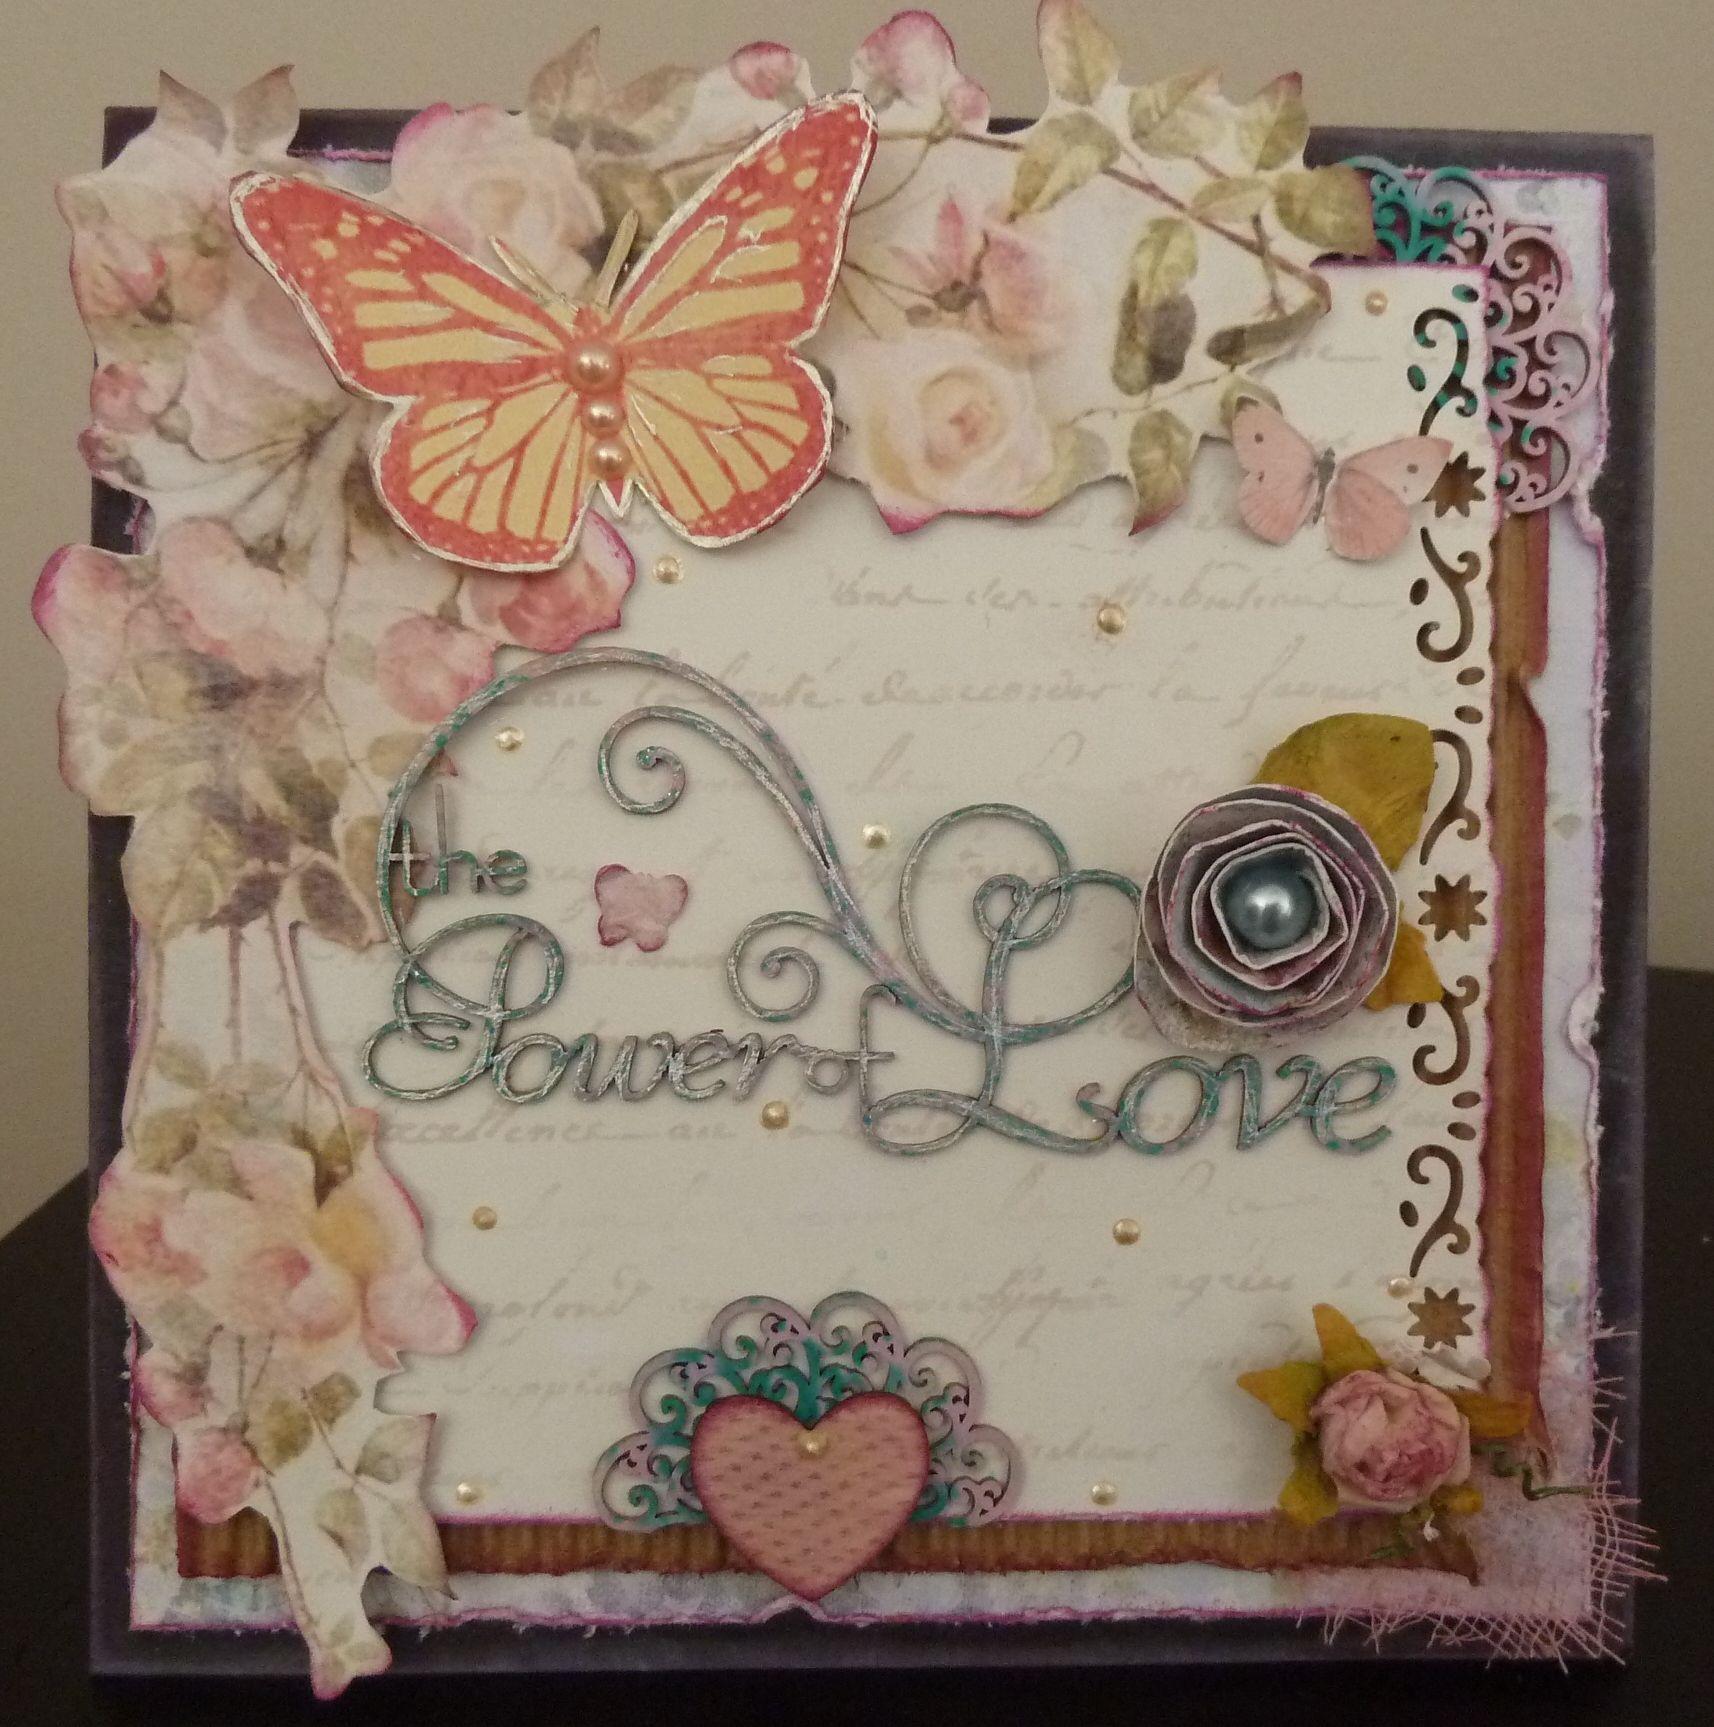 "The Power of Love-μια ρομαντική καρτούλα στα χρώματα που αγαπώ. Η συμμετοχή μου στο http://craftylifechallenges.blogspot.gr/2016/02/february-2016-challenge.html με θέμα ""I love..."" <3 , στην πρόκληση Φεβρουαρίου στο  scrapsnpiecesgr.blogspot.gr  και στο διαγωνισμό http://scrapbooking.gr/corner/%CF%86%CE%B5%CE%B2%CF%81%CE%BF%CF%85%CE%AC%CF%81%CE%B9%CE%BF%CF%82-2016-%CF%80%CF%81%CF%8C%CE%BA%CE%BB%CE%B7%CF%83%CE%B7/?contest=photo-detail&photo_id=4346#goto-challenge μαζί με ένα ρομαντικό…"